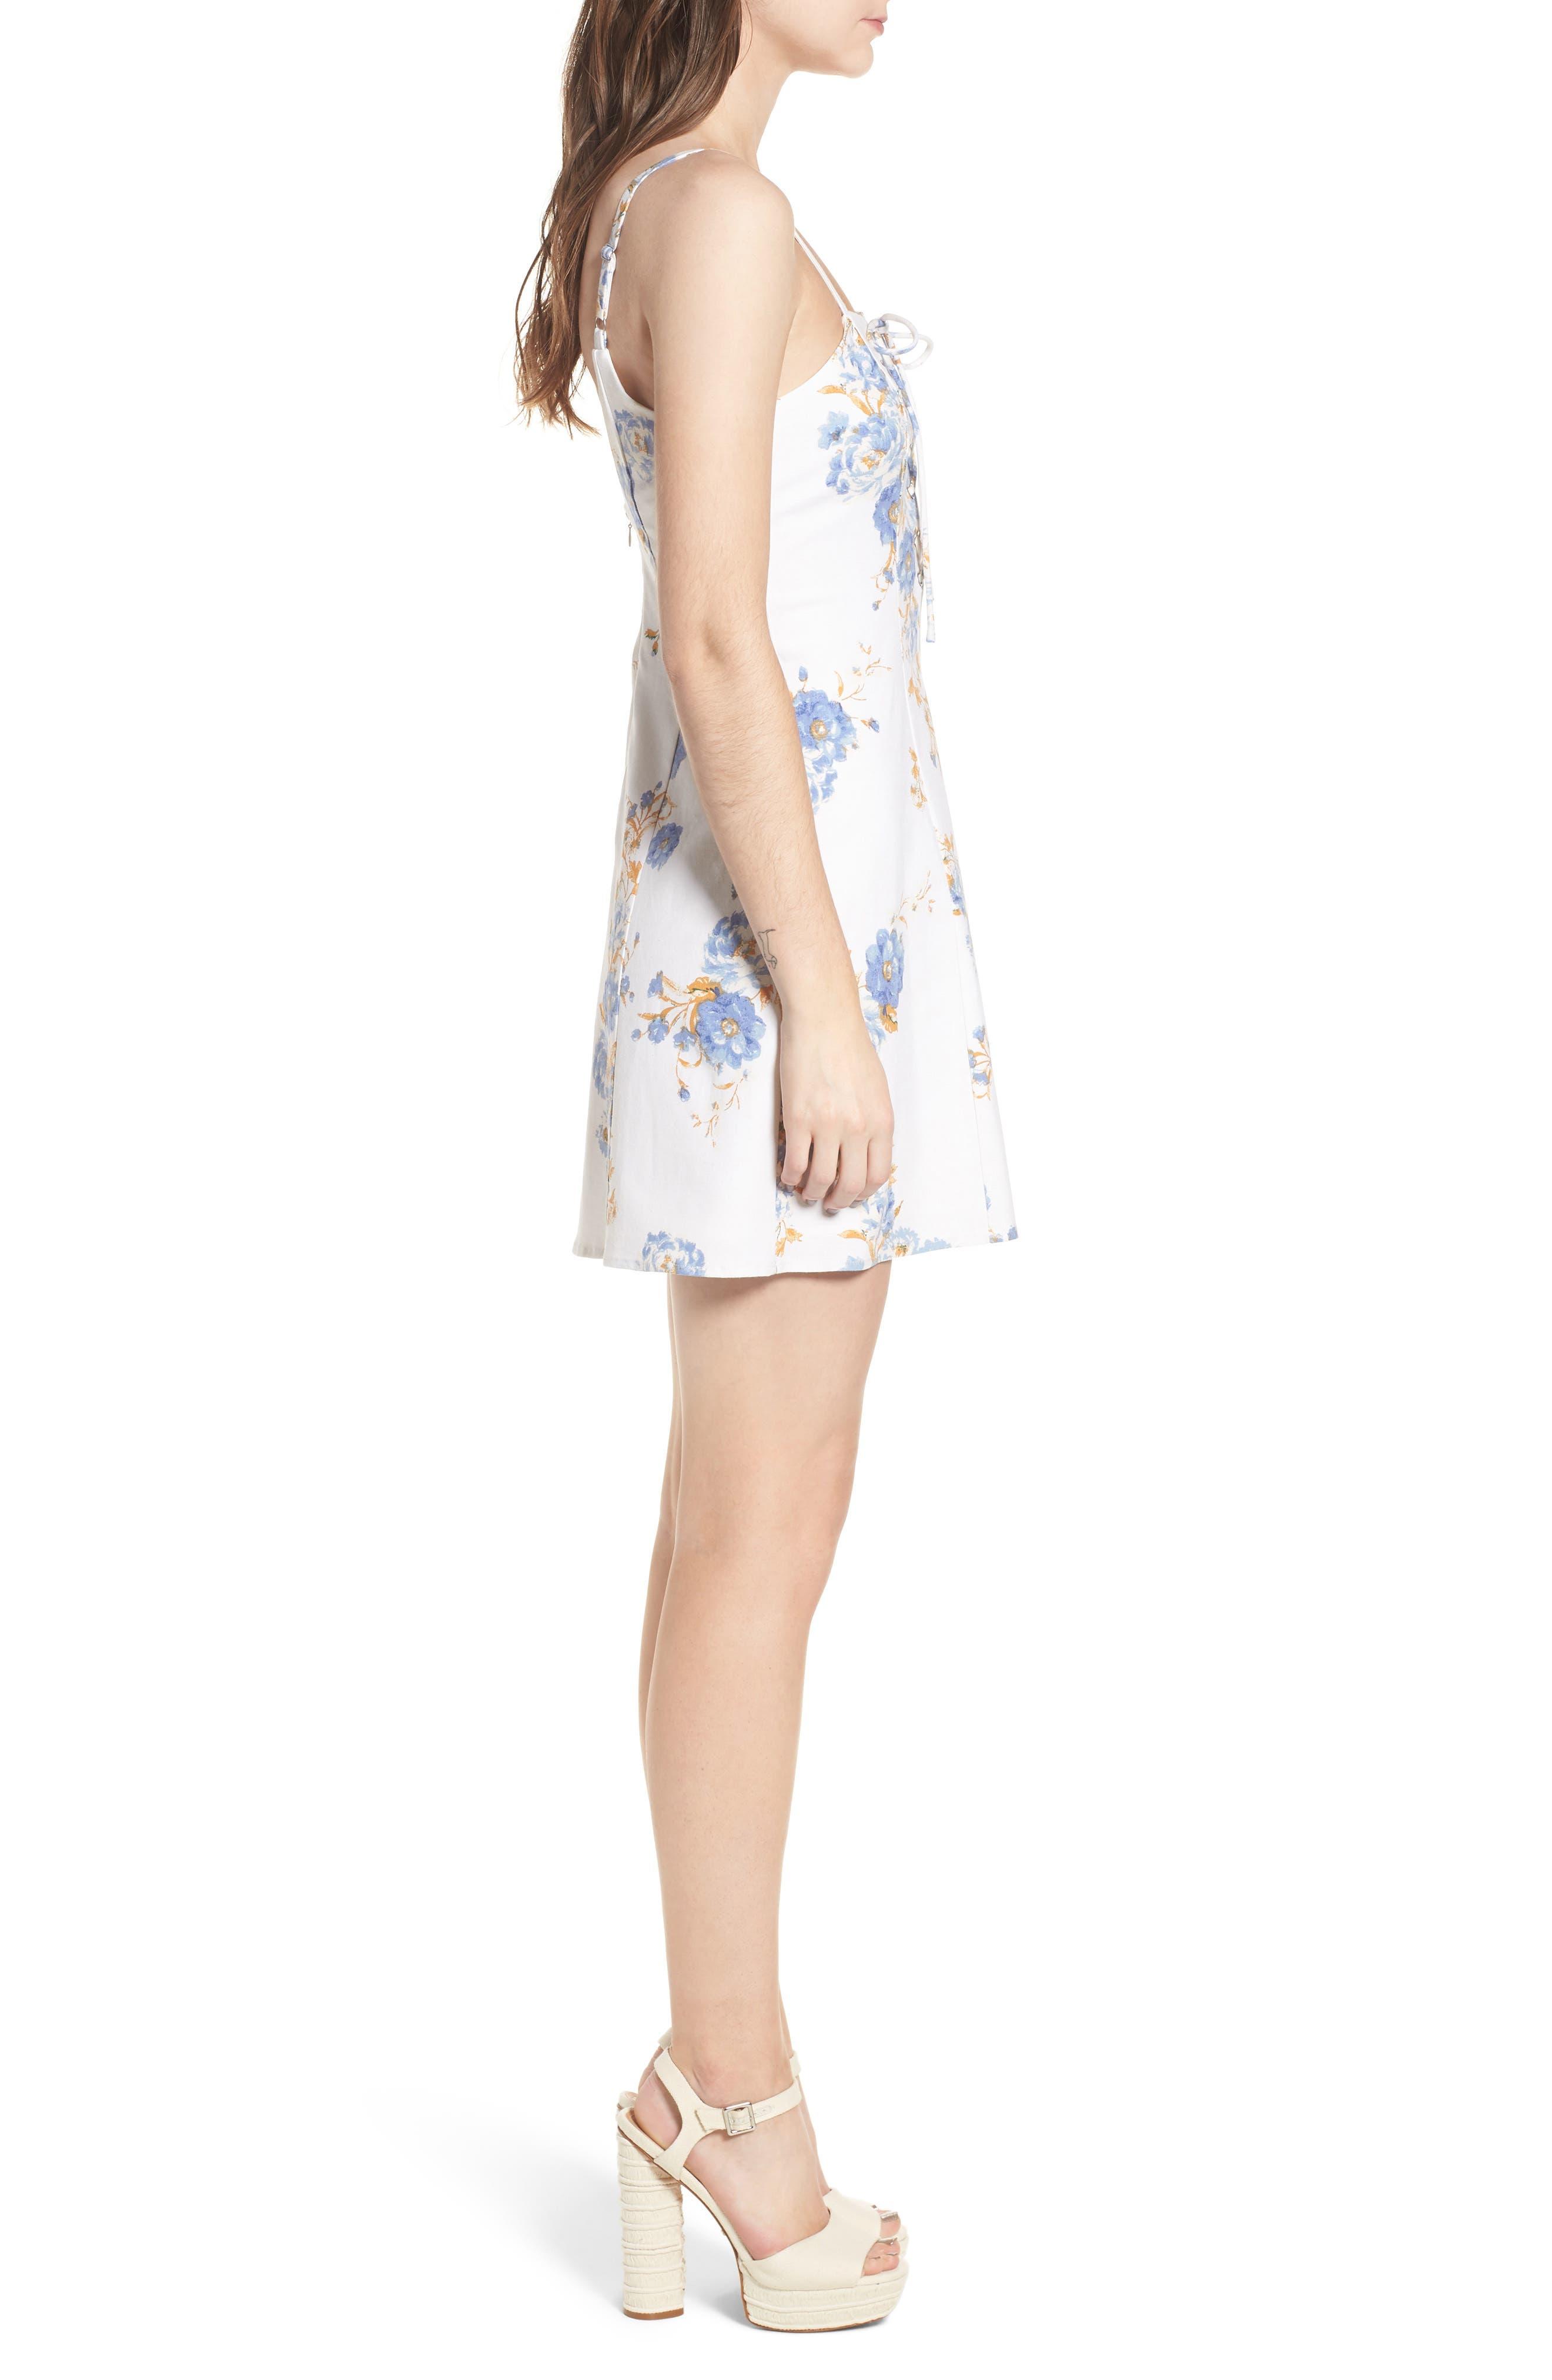 Modena Lace-Up Minidress,                             Alternate thumbnail 3, color,                             Ivory Floral